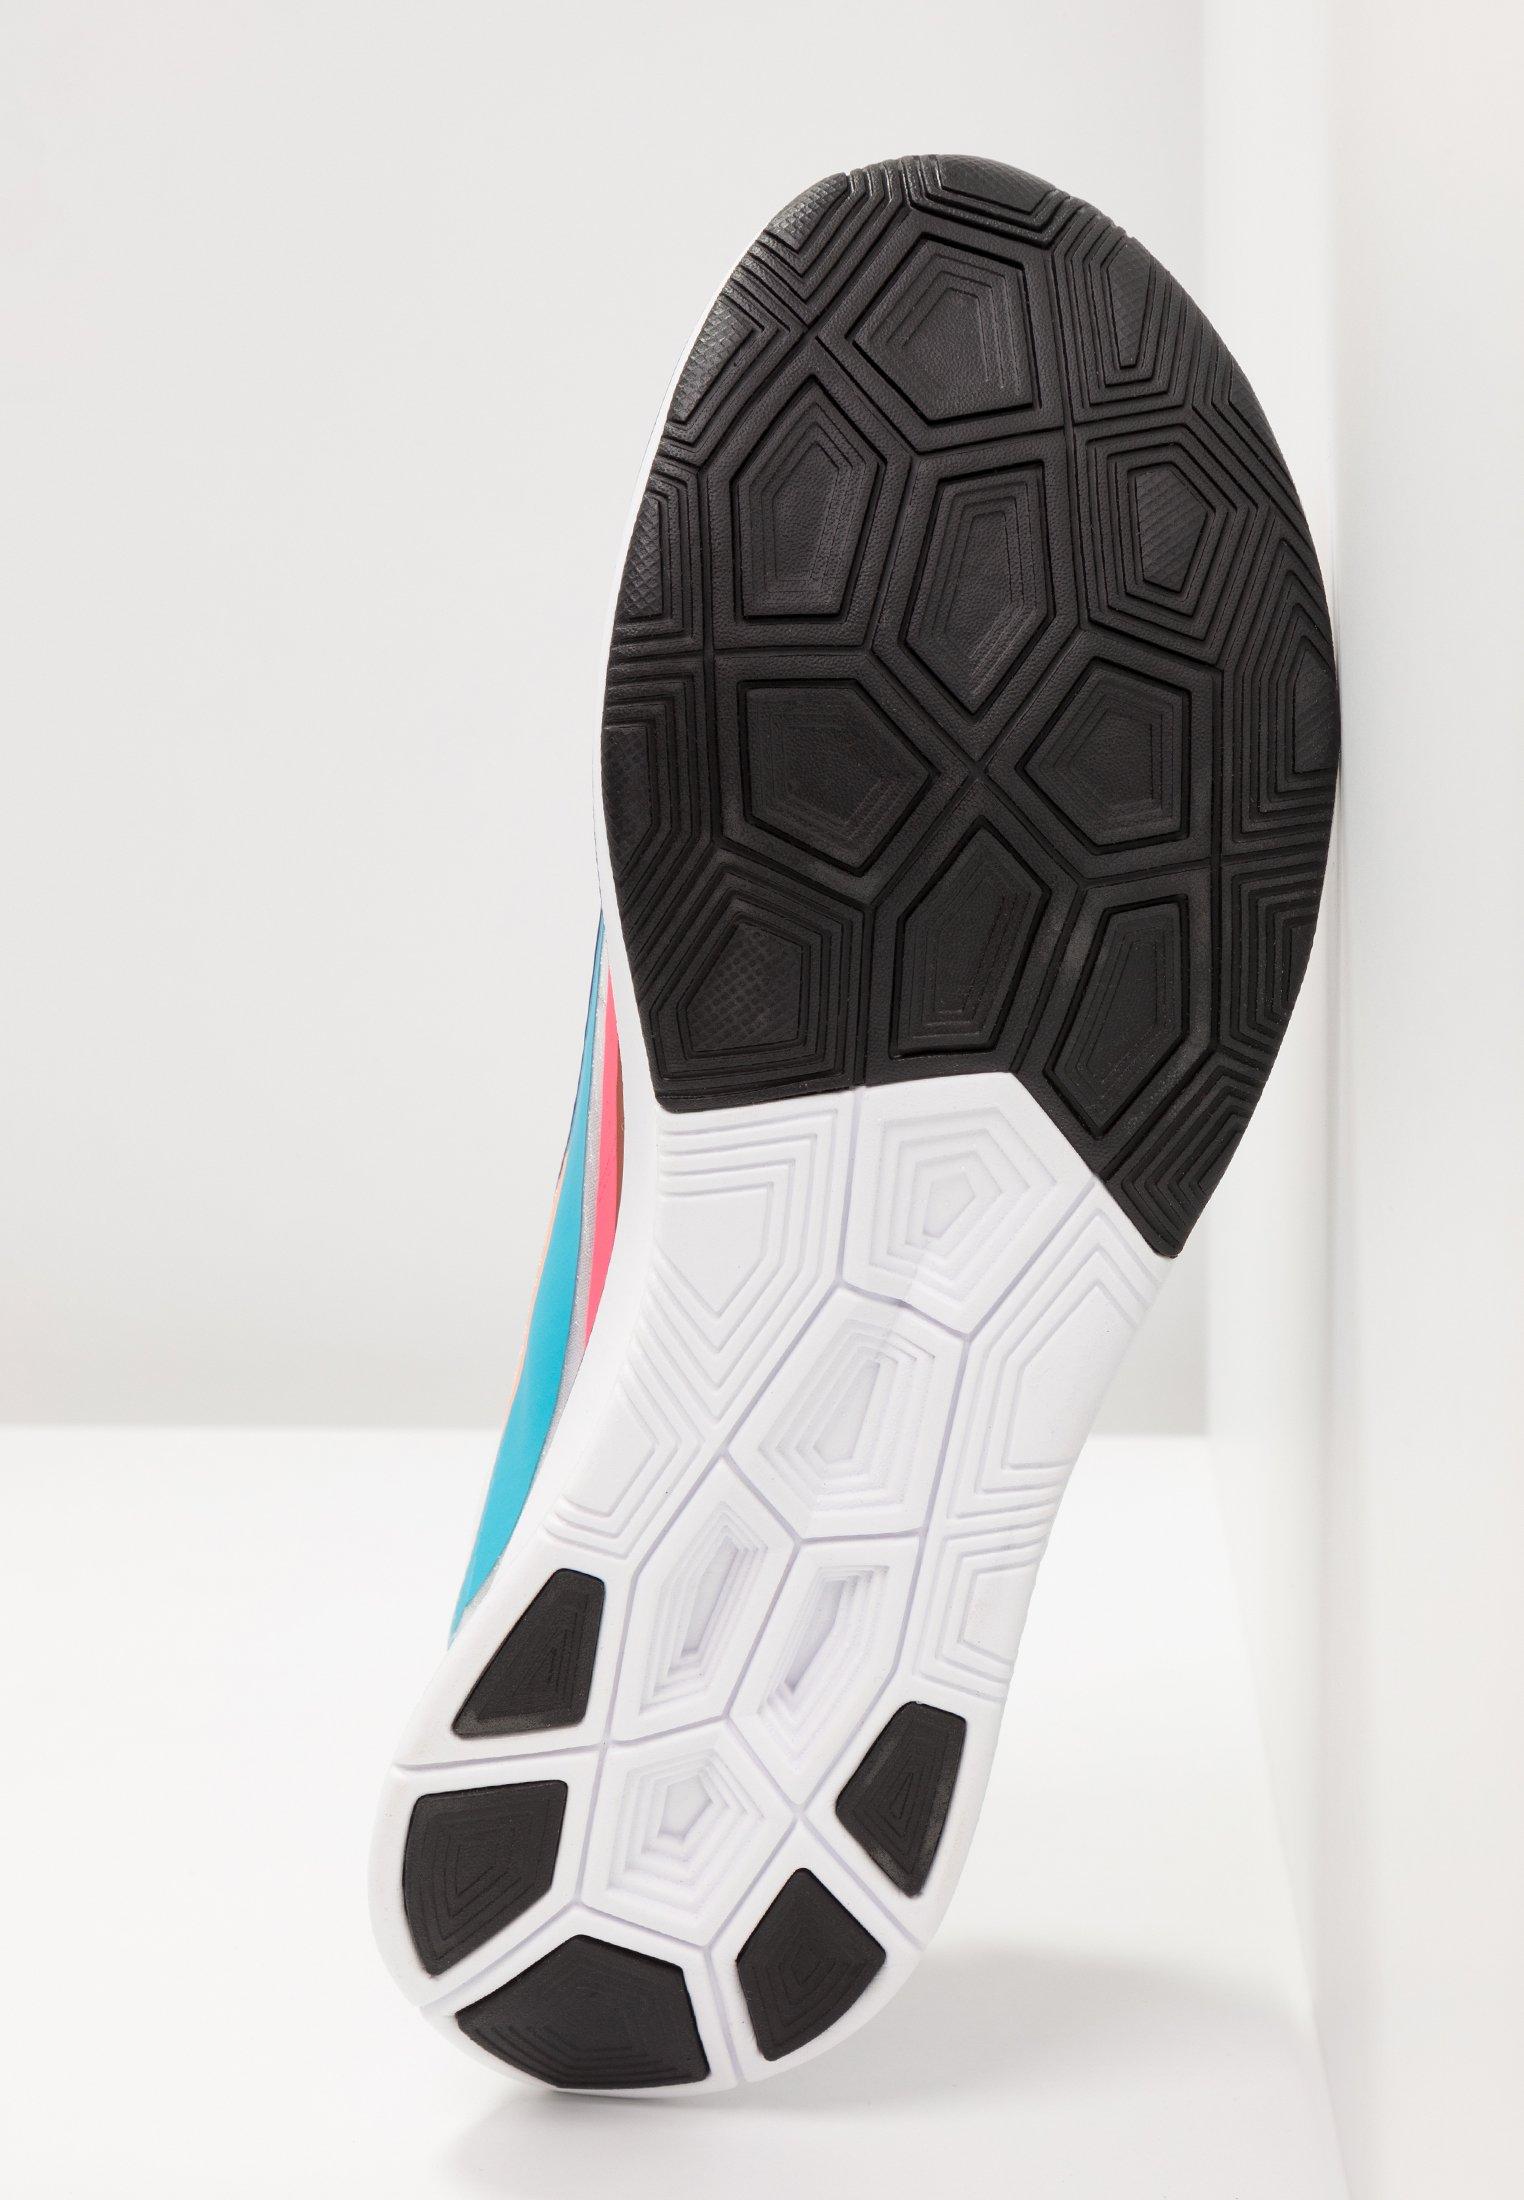 ARTIST FLY FASTChaussures compétition white Nike running black ZOOM Performance blue fury de 5A4jL3R